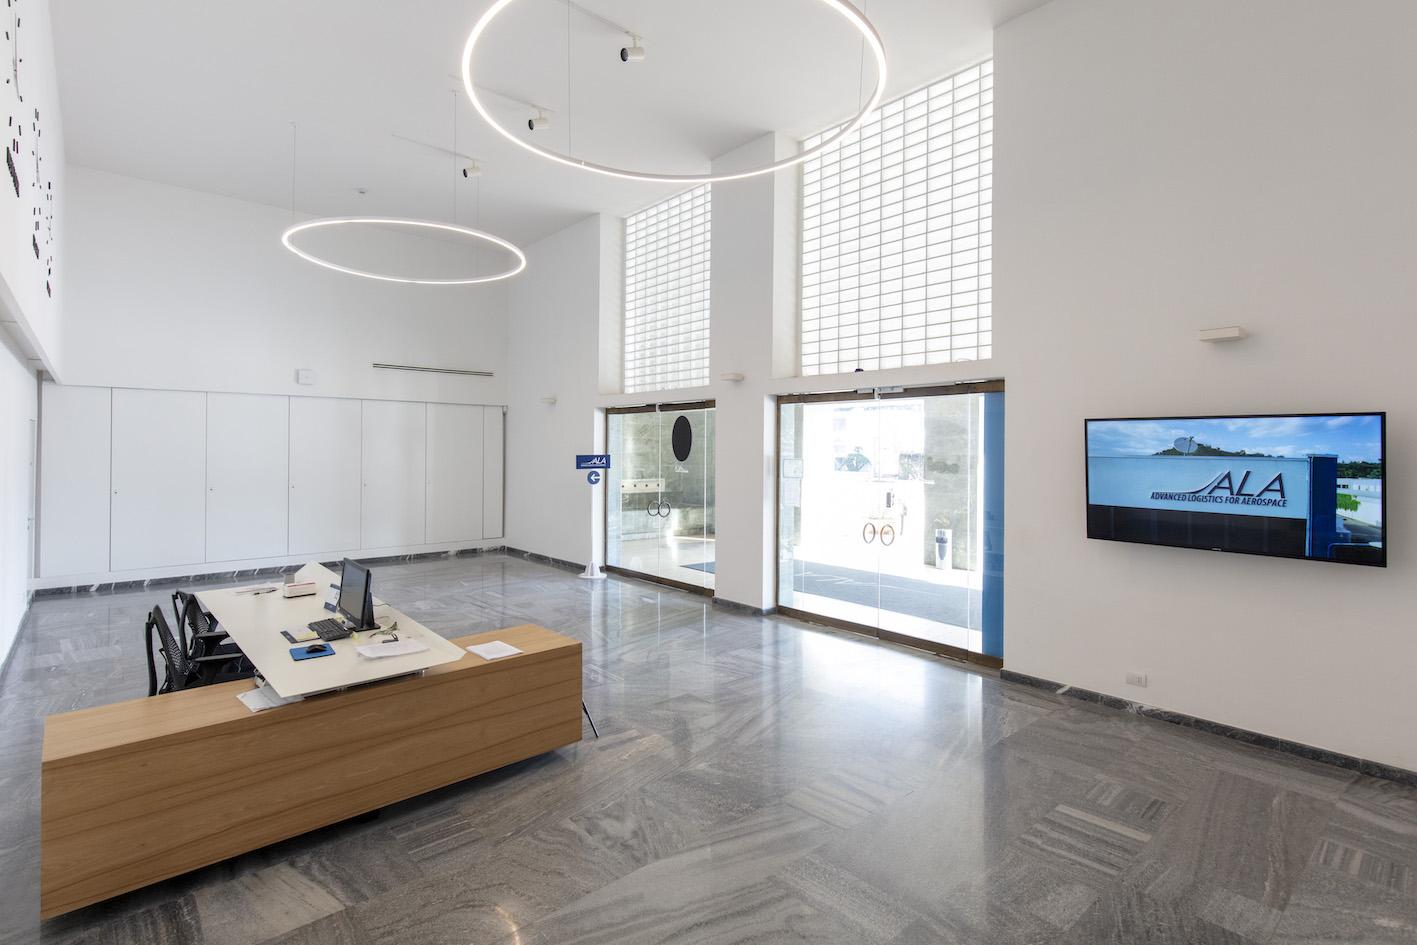 ALA Headquarters Hall - foto ©Amedeo Benestante